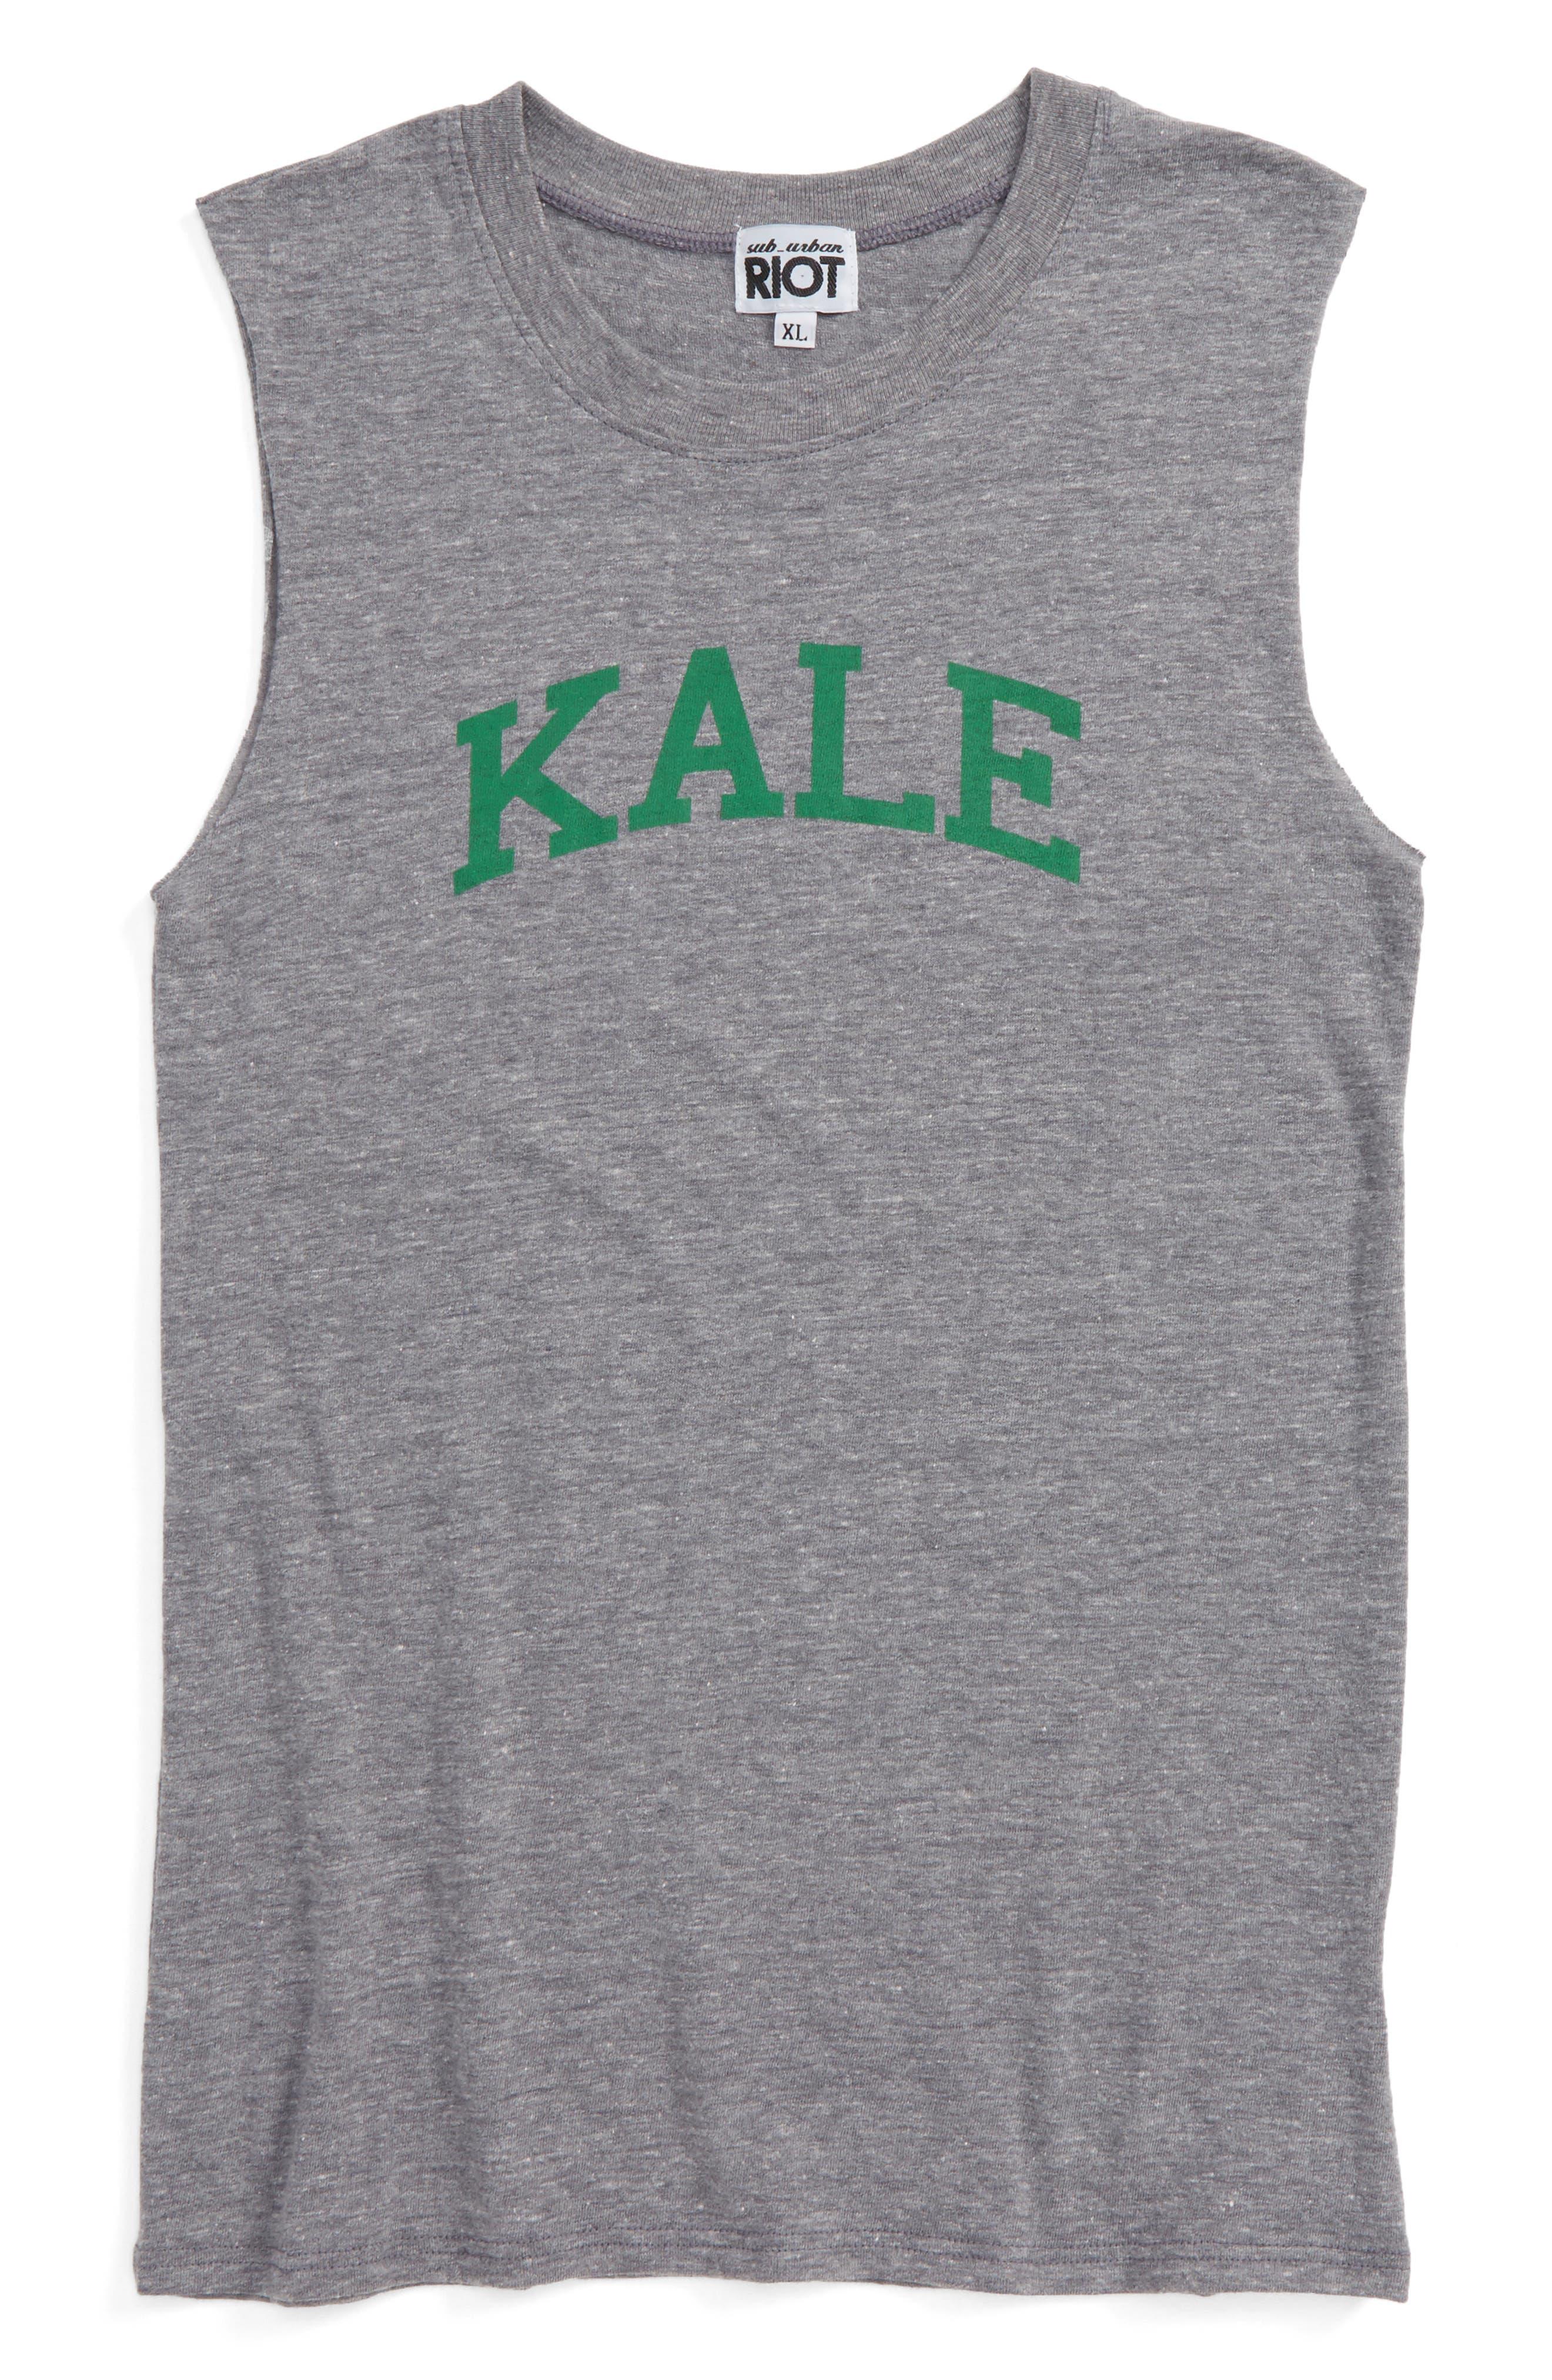 SUB_URBAN RIOT Kale Muscle Tee